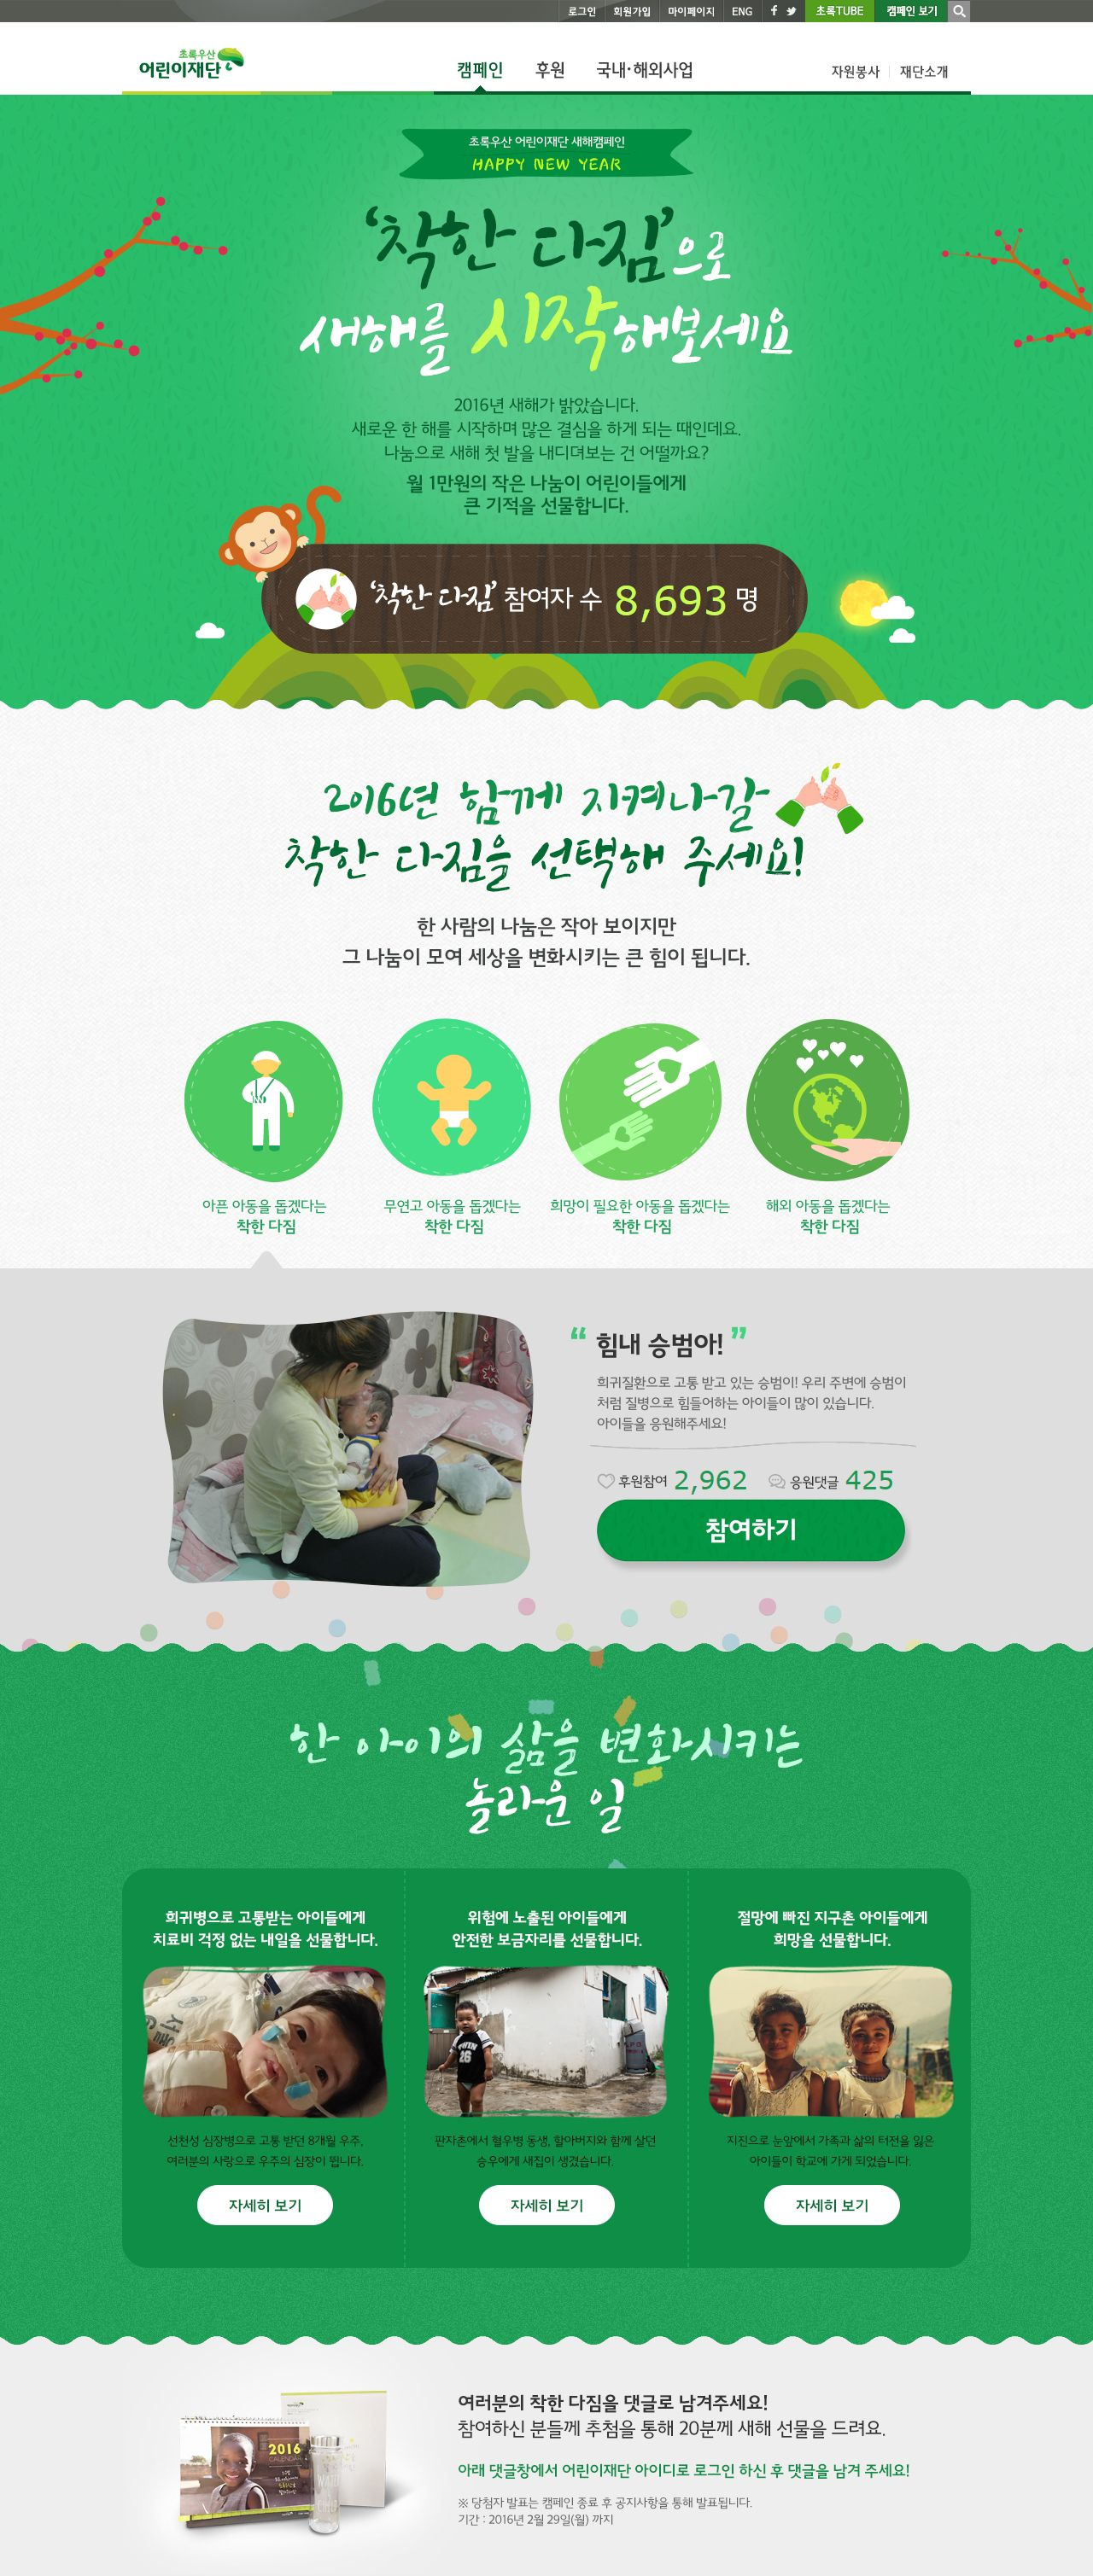 ��������������� 2016������� event design pinterest promotion